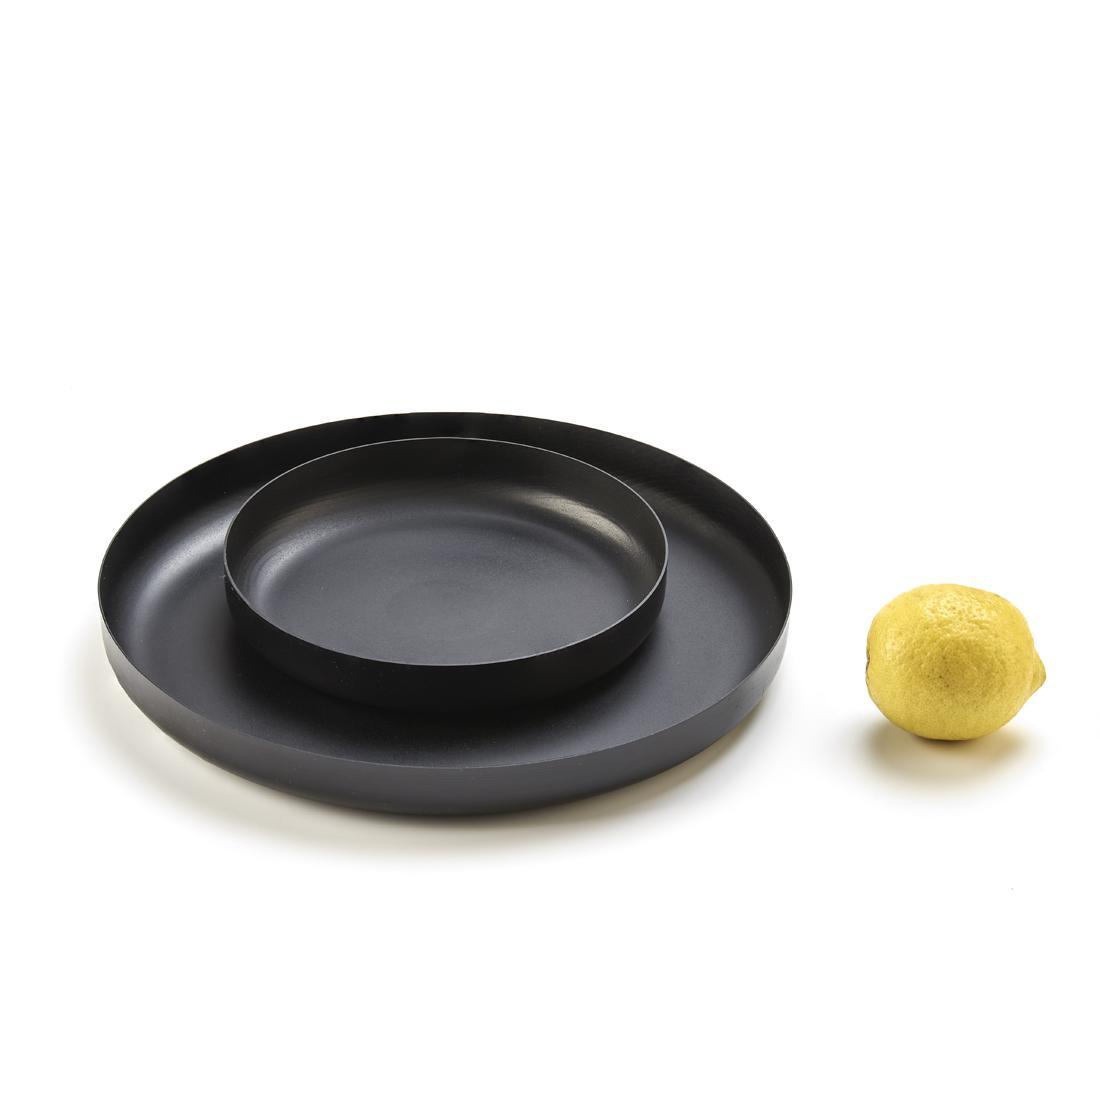 AETHER dish set